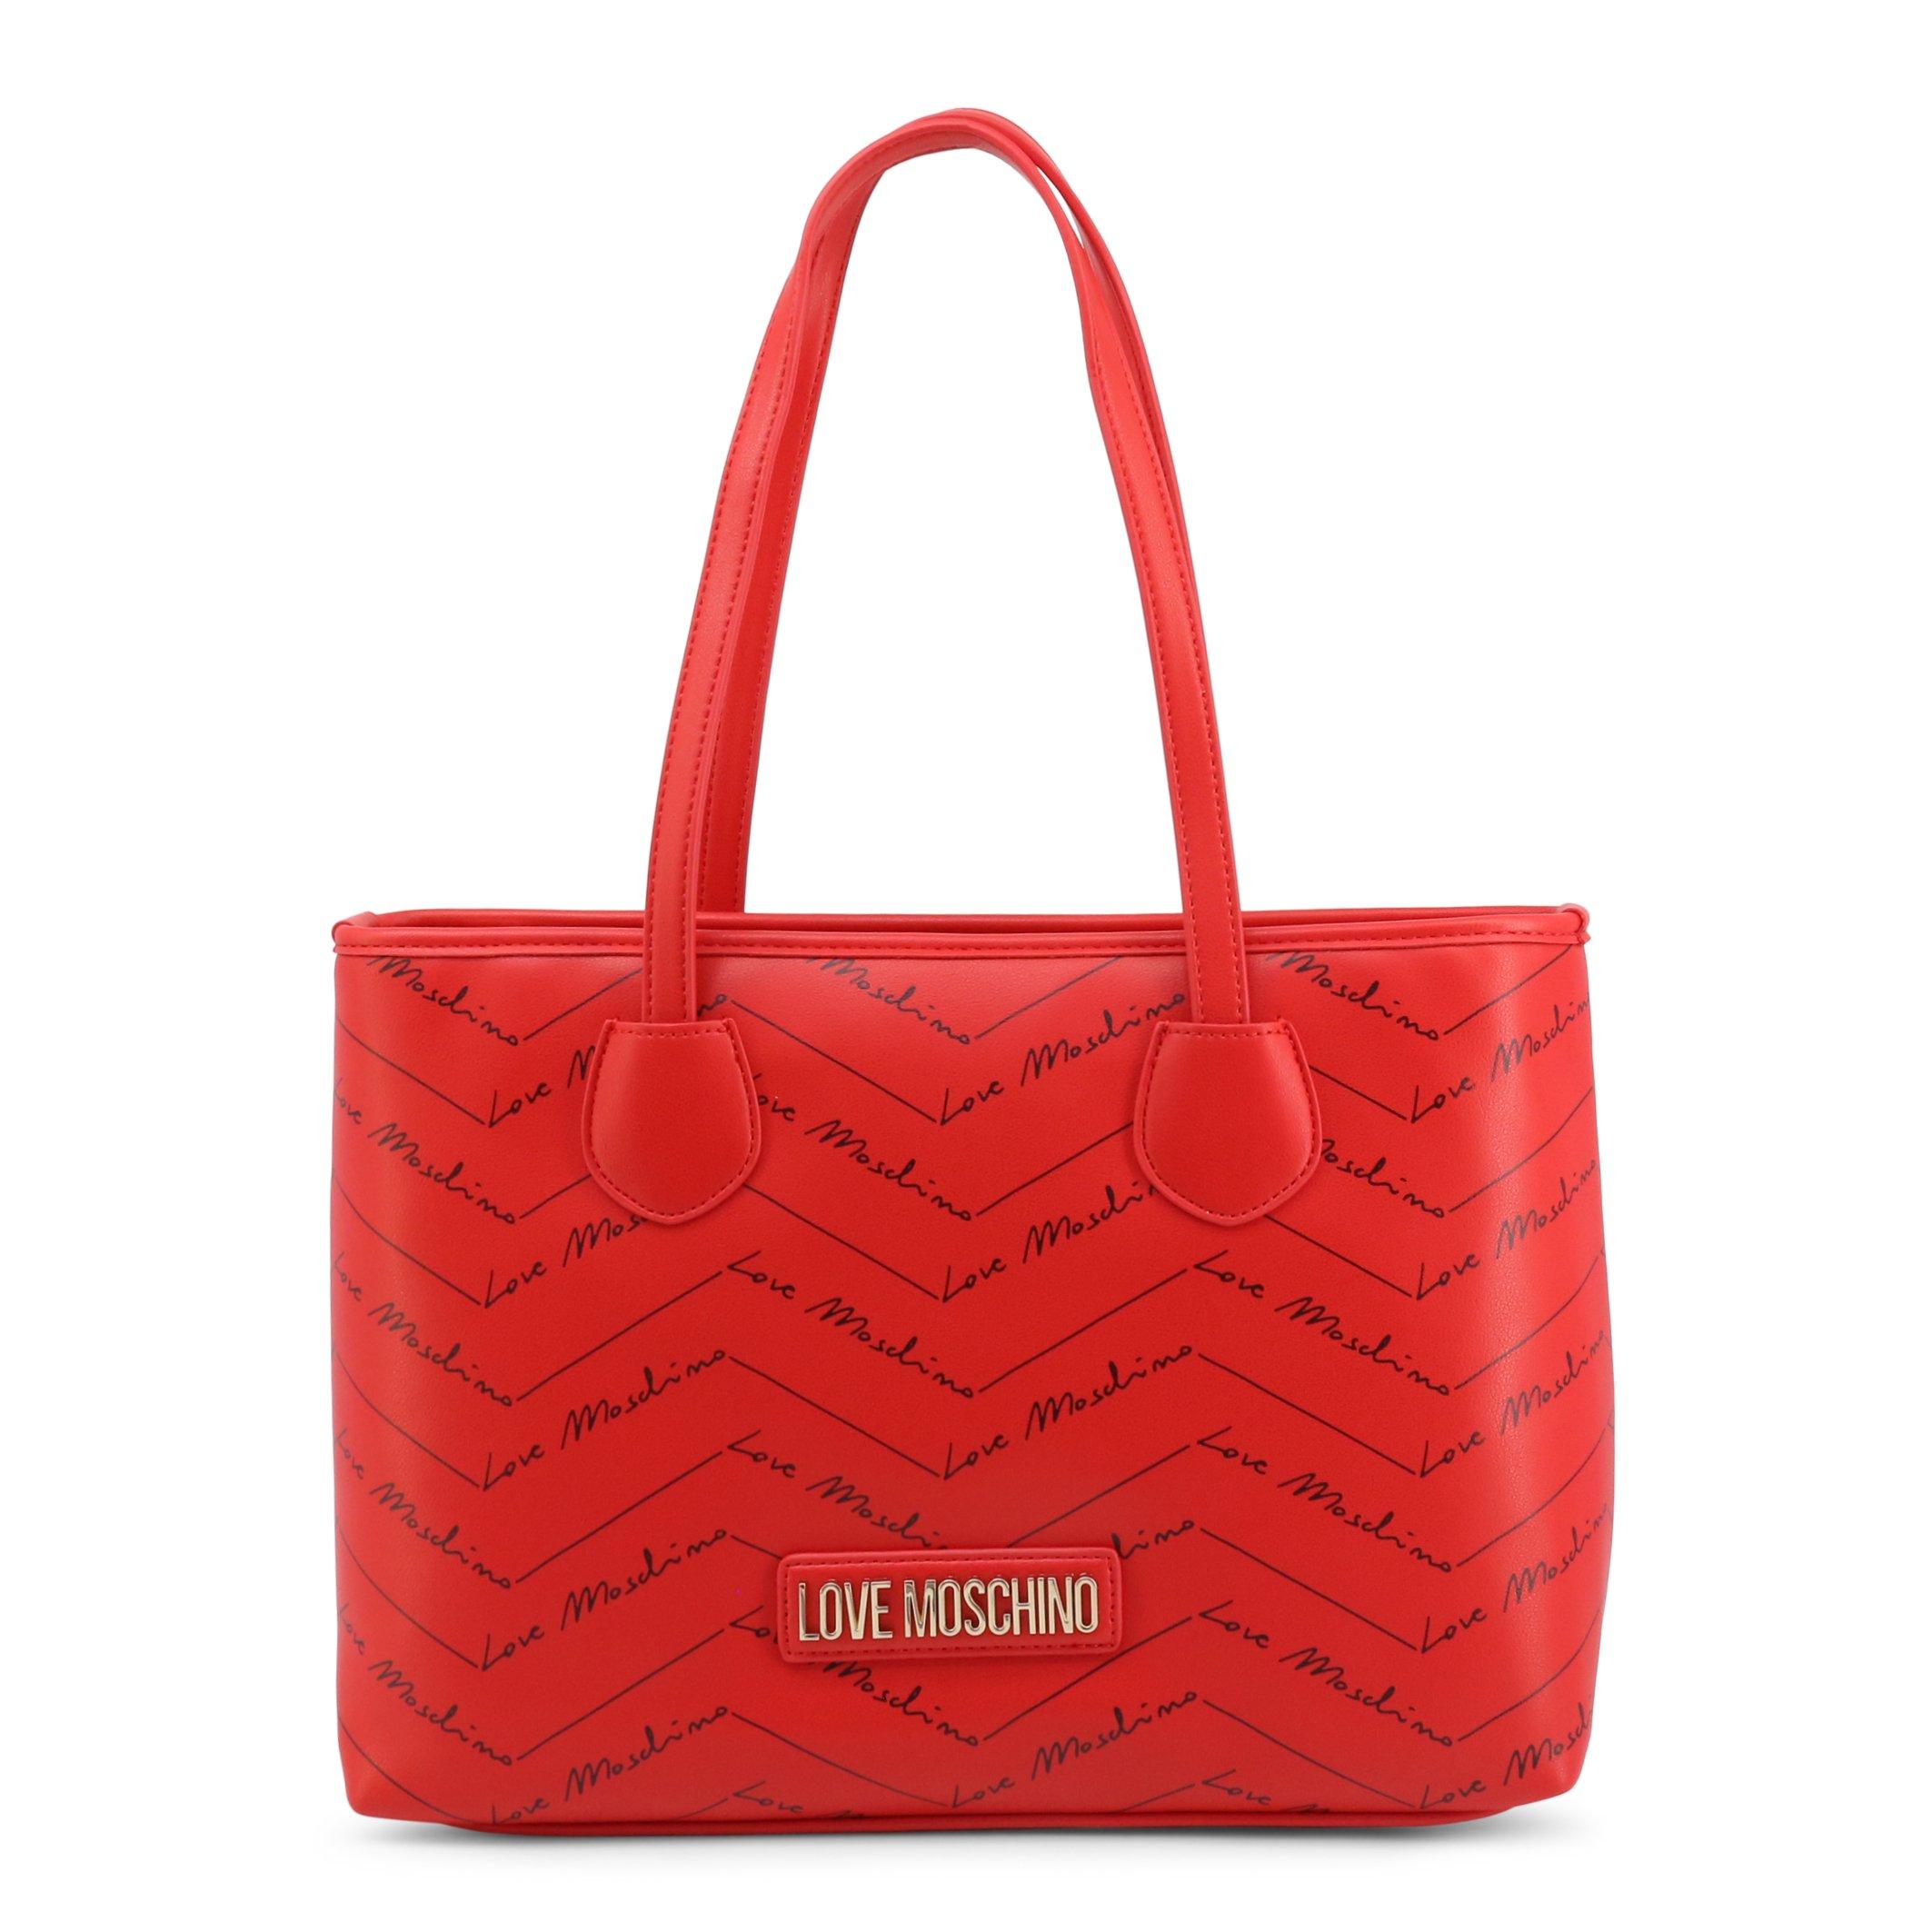 Love Moschino Women's Shoulder Bag Various Colours JC4243PP0BKH - red NOSIZE